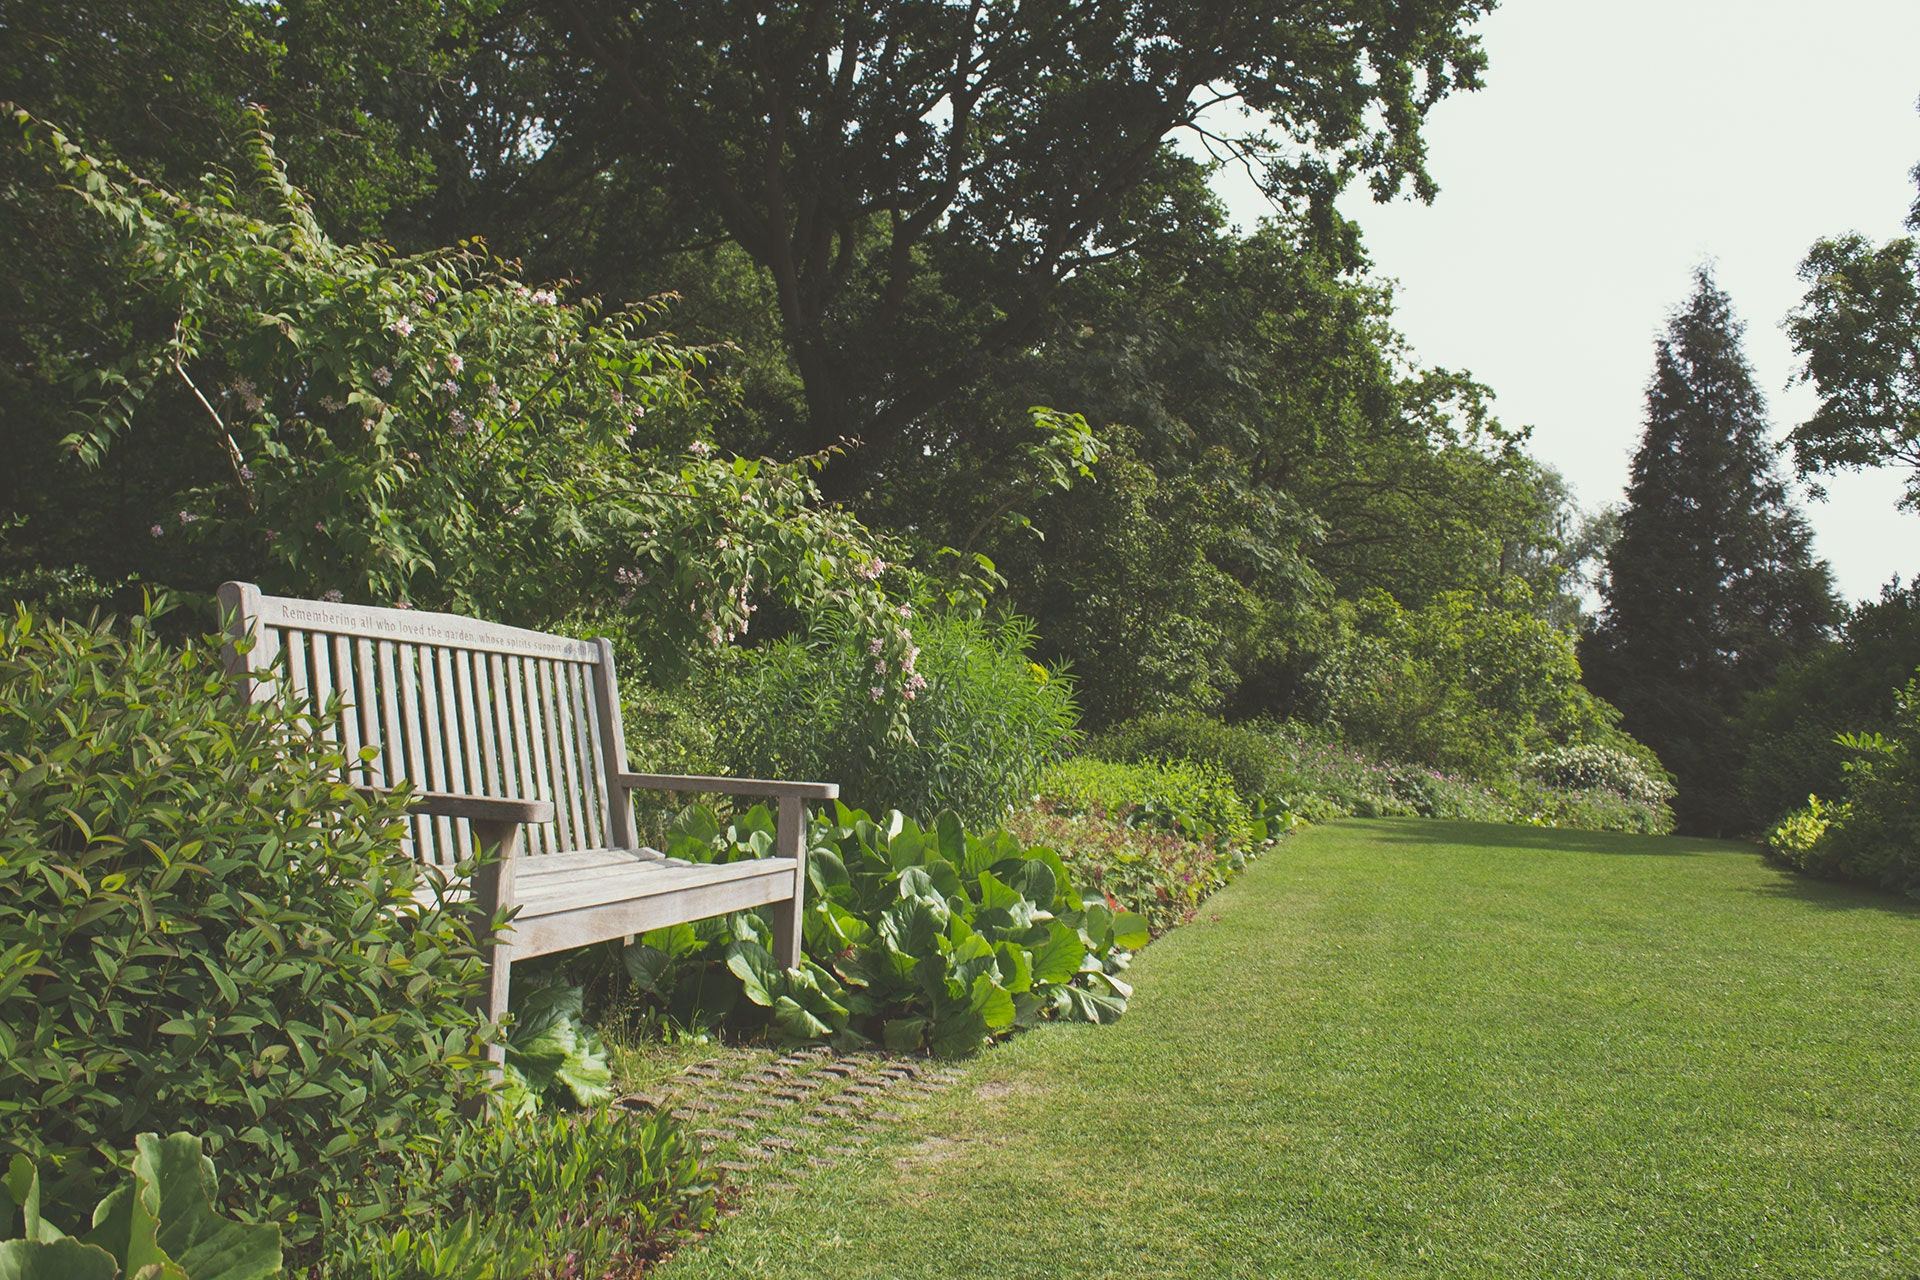 Merveilleux Free Stock Photo Of Garden